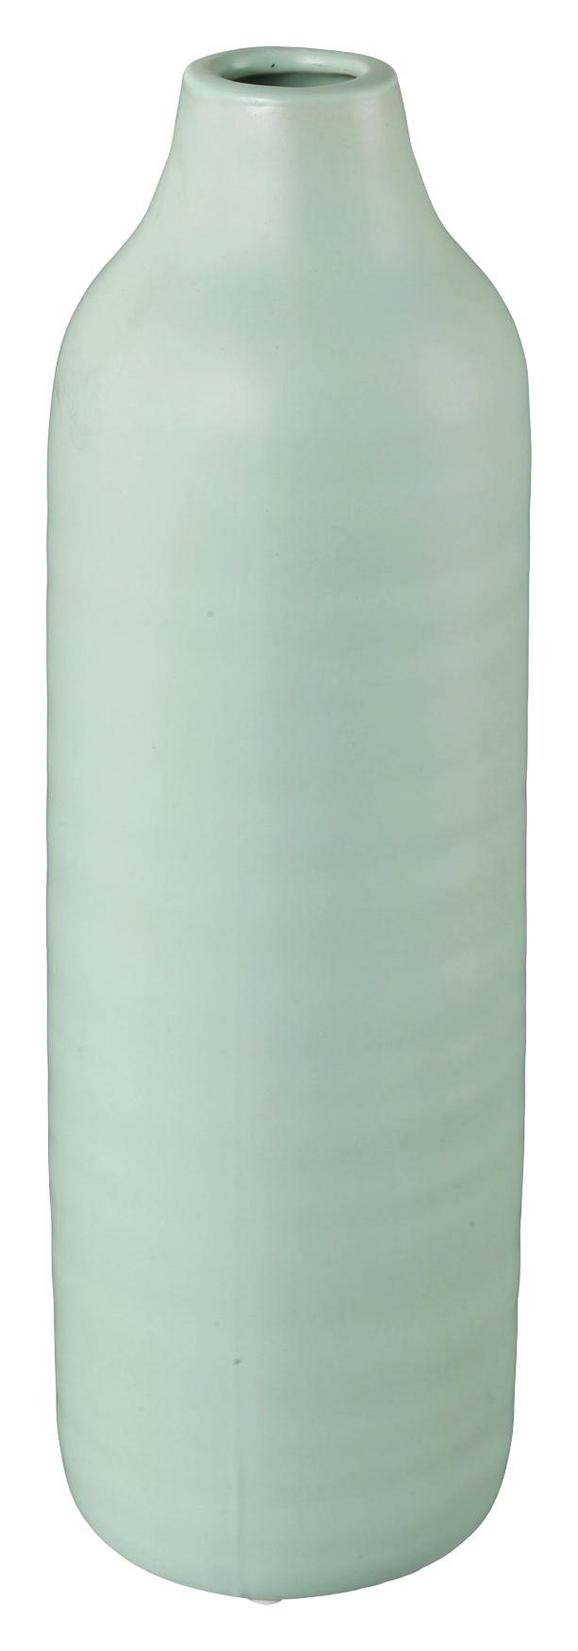 Dekovase Presence Grün 9x24 cm - Grün, LIFESTYLE, Keramik (9/24cm)